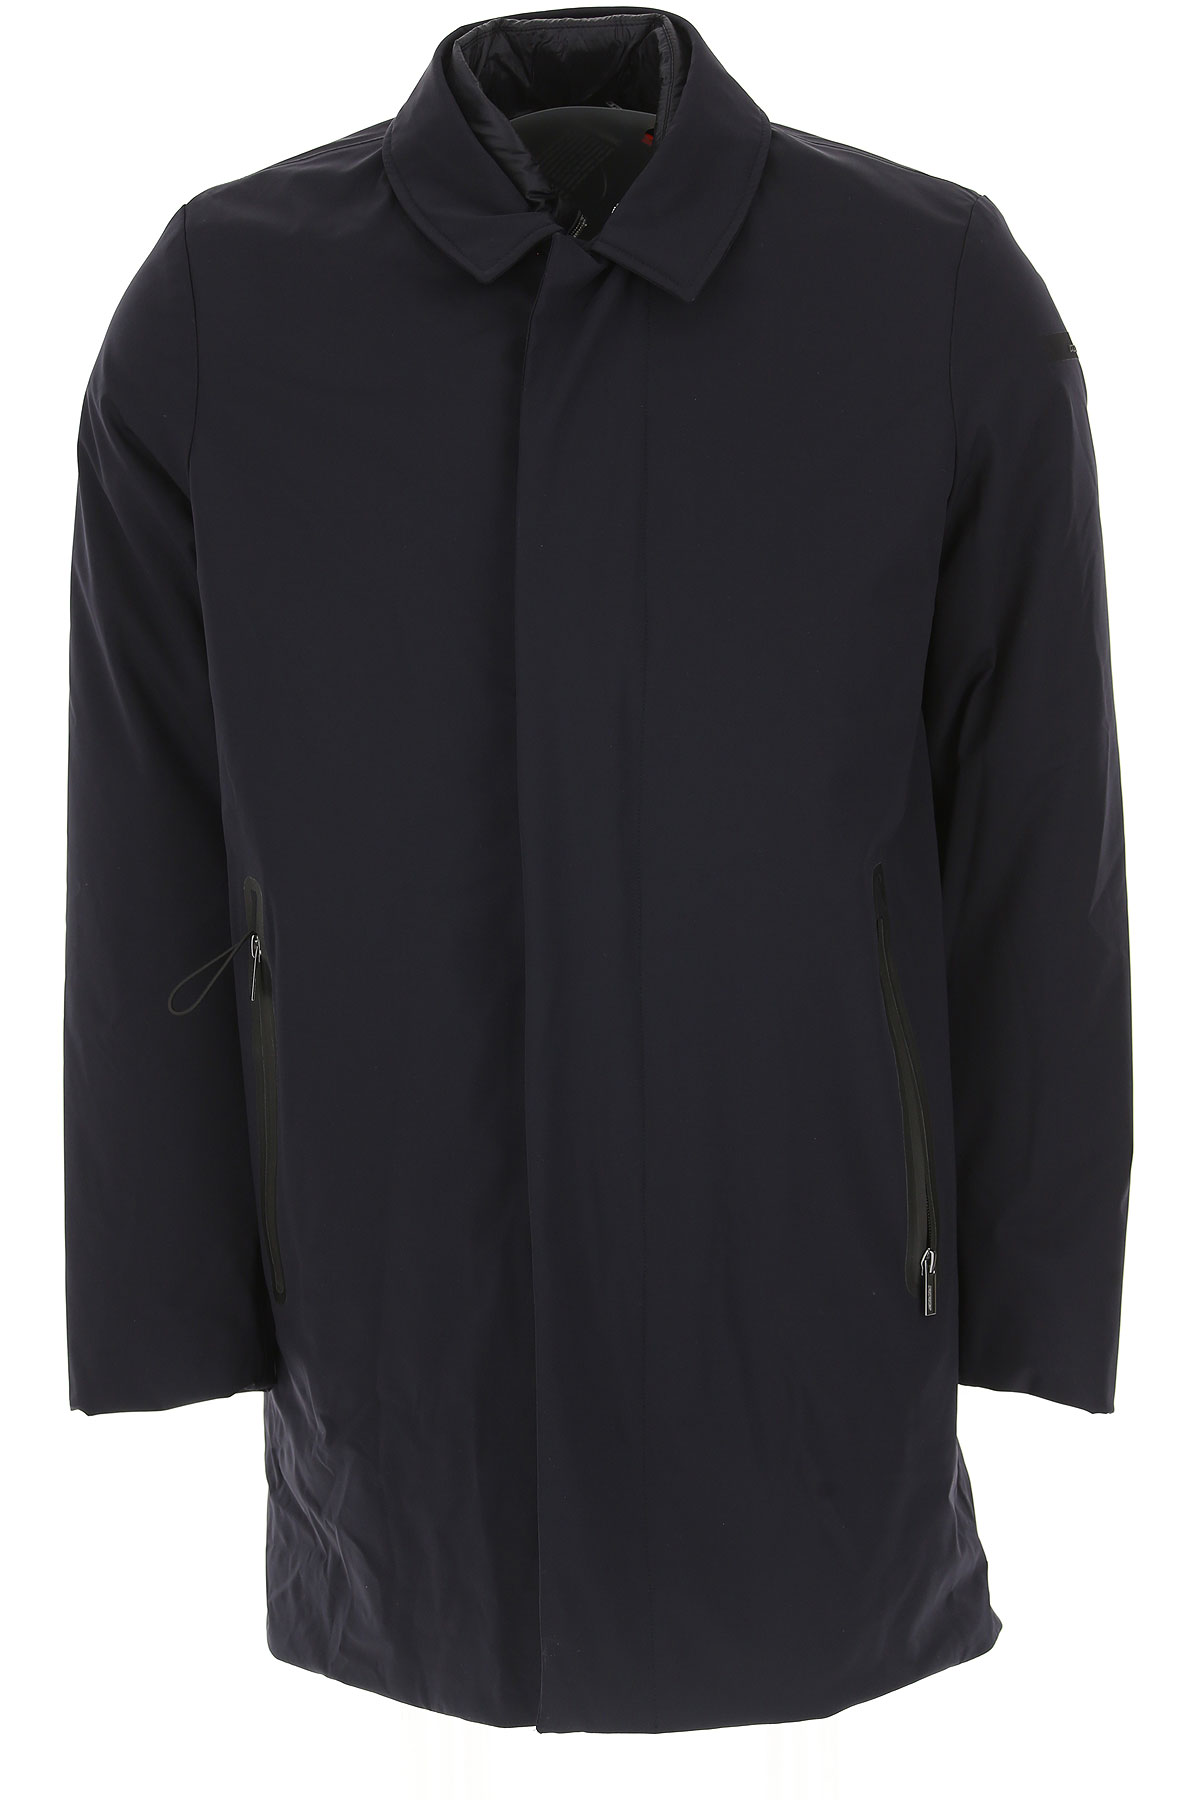 Image of RRD Down Jacket for Men, Puffer Ski Jacket, Blu Navy, polyamide, 2017, L M S XL XXL XXXL